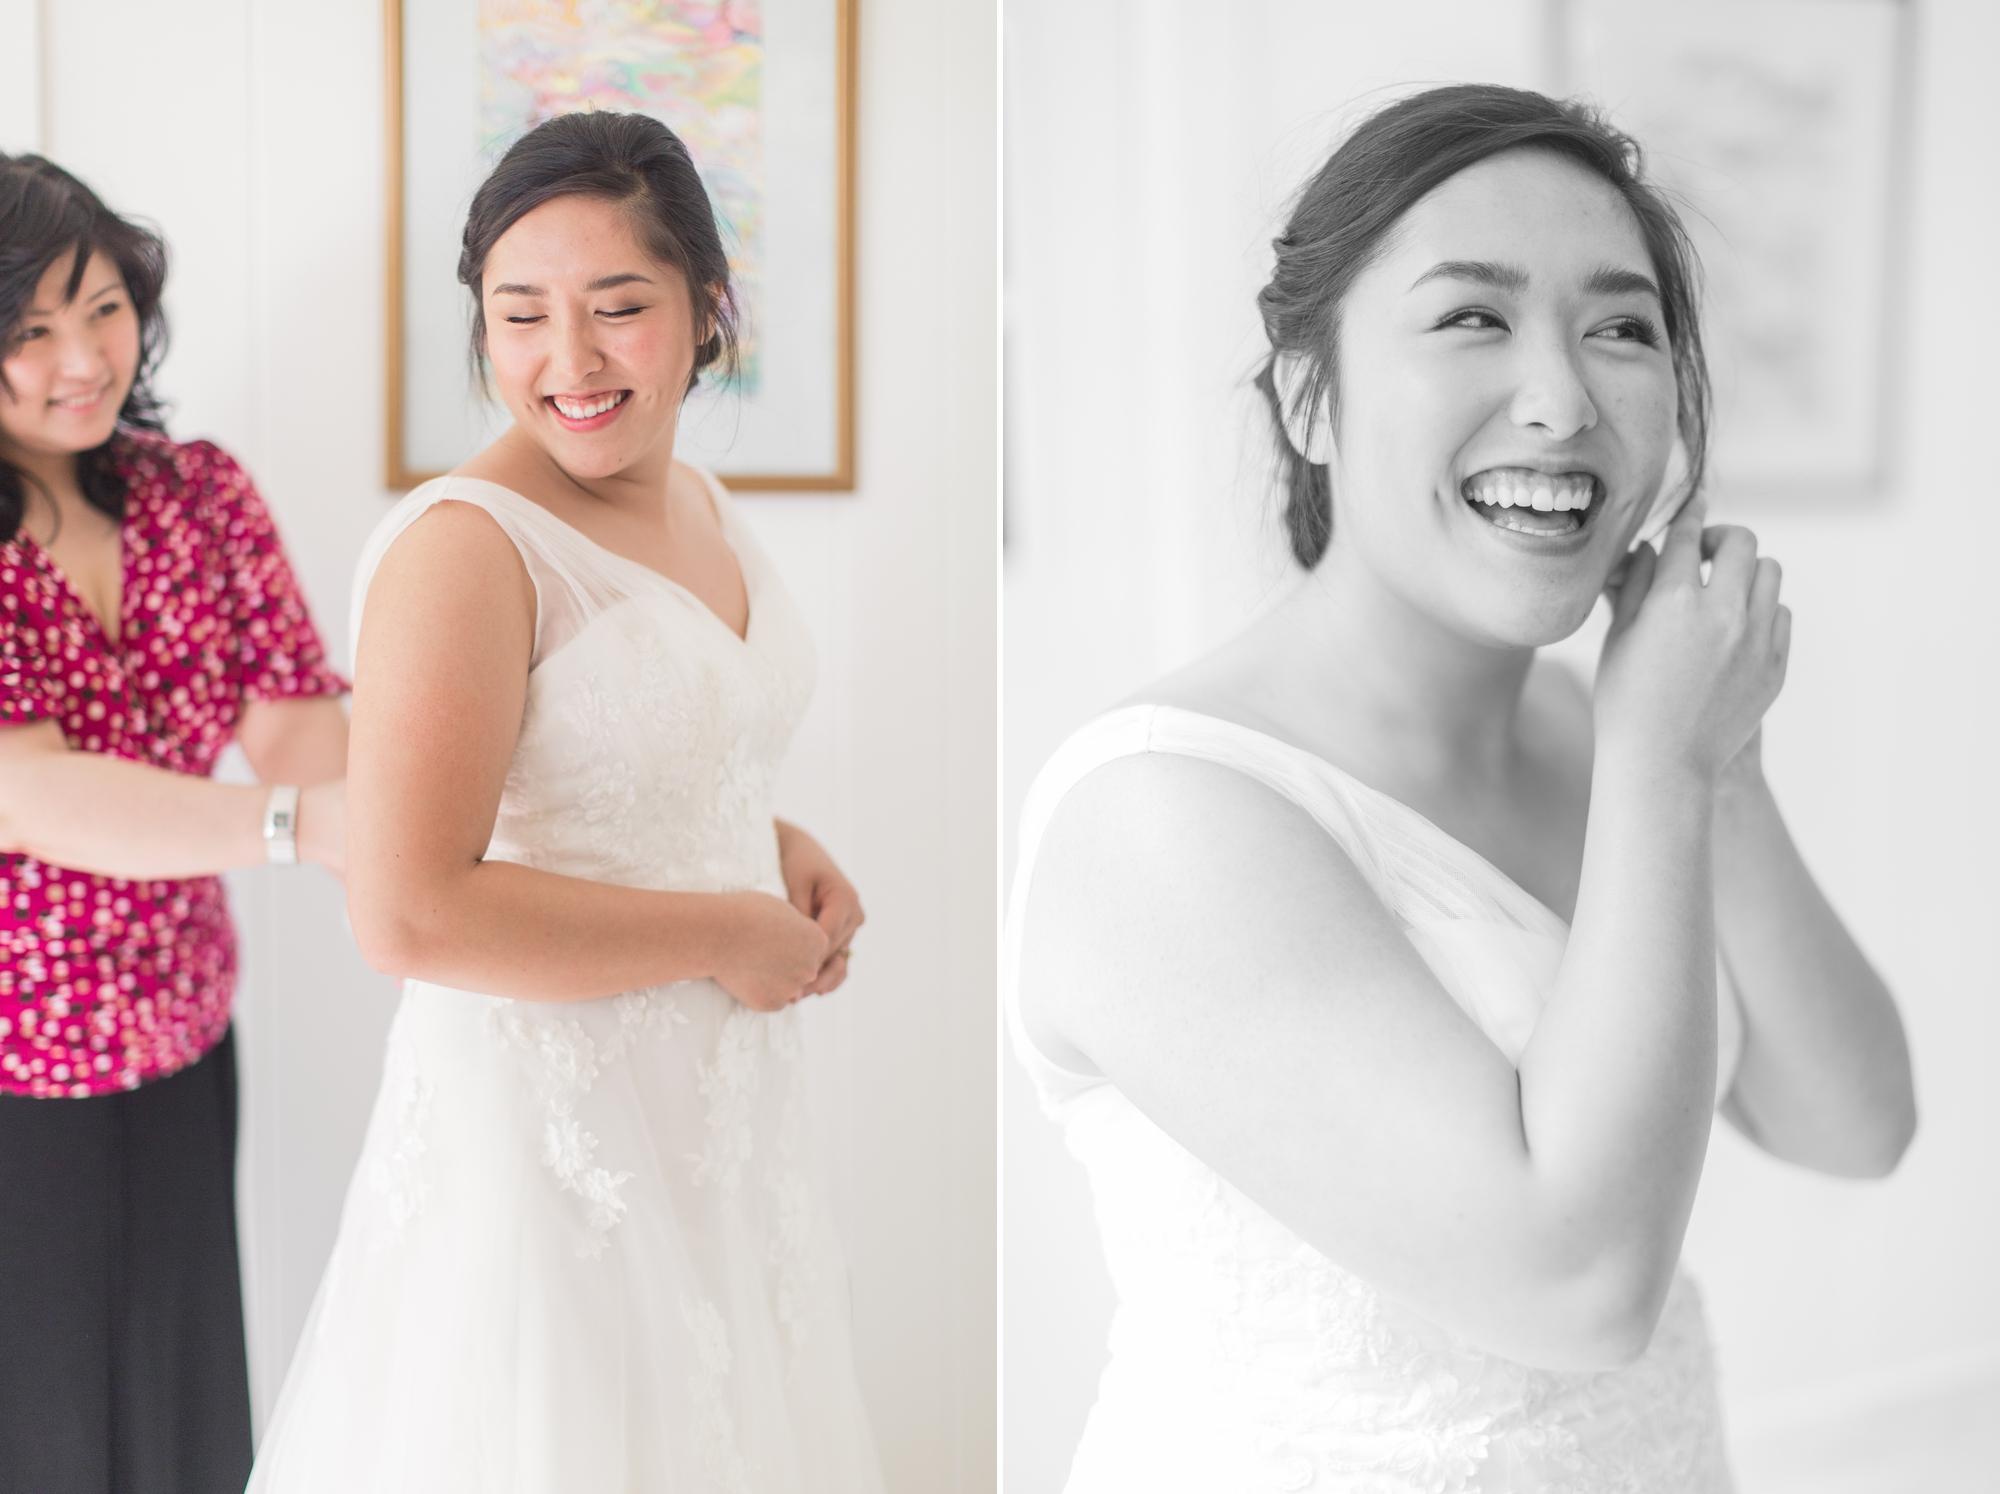 giles wedding blog 7.jpg